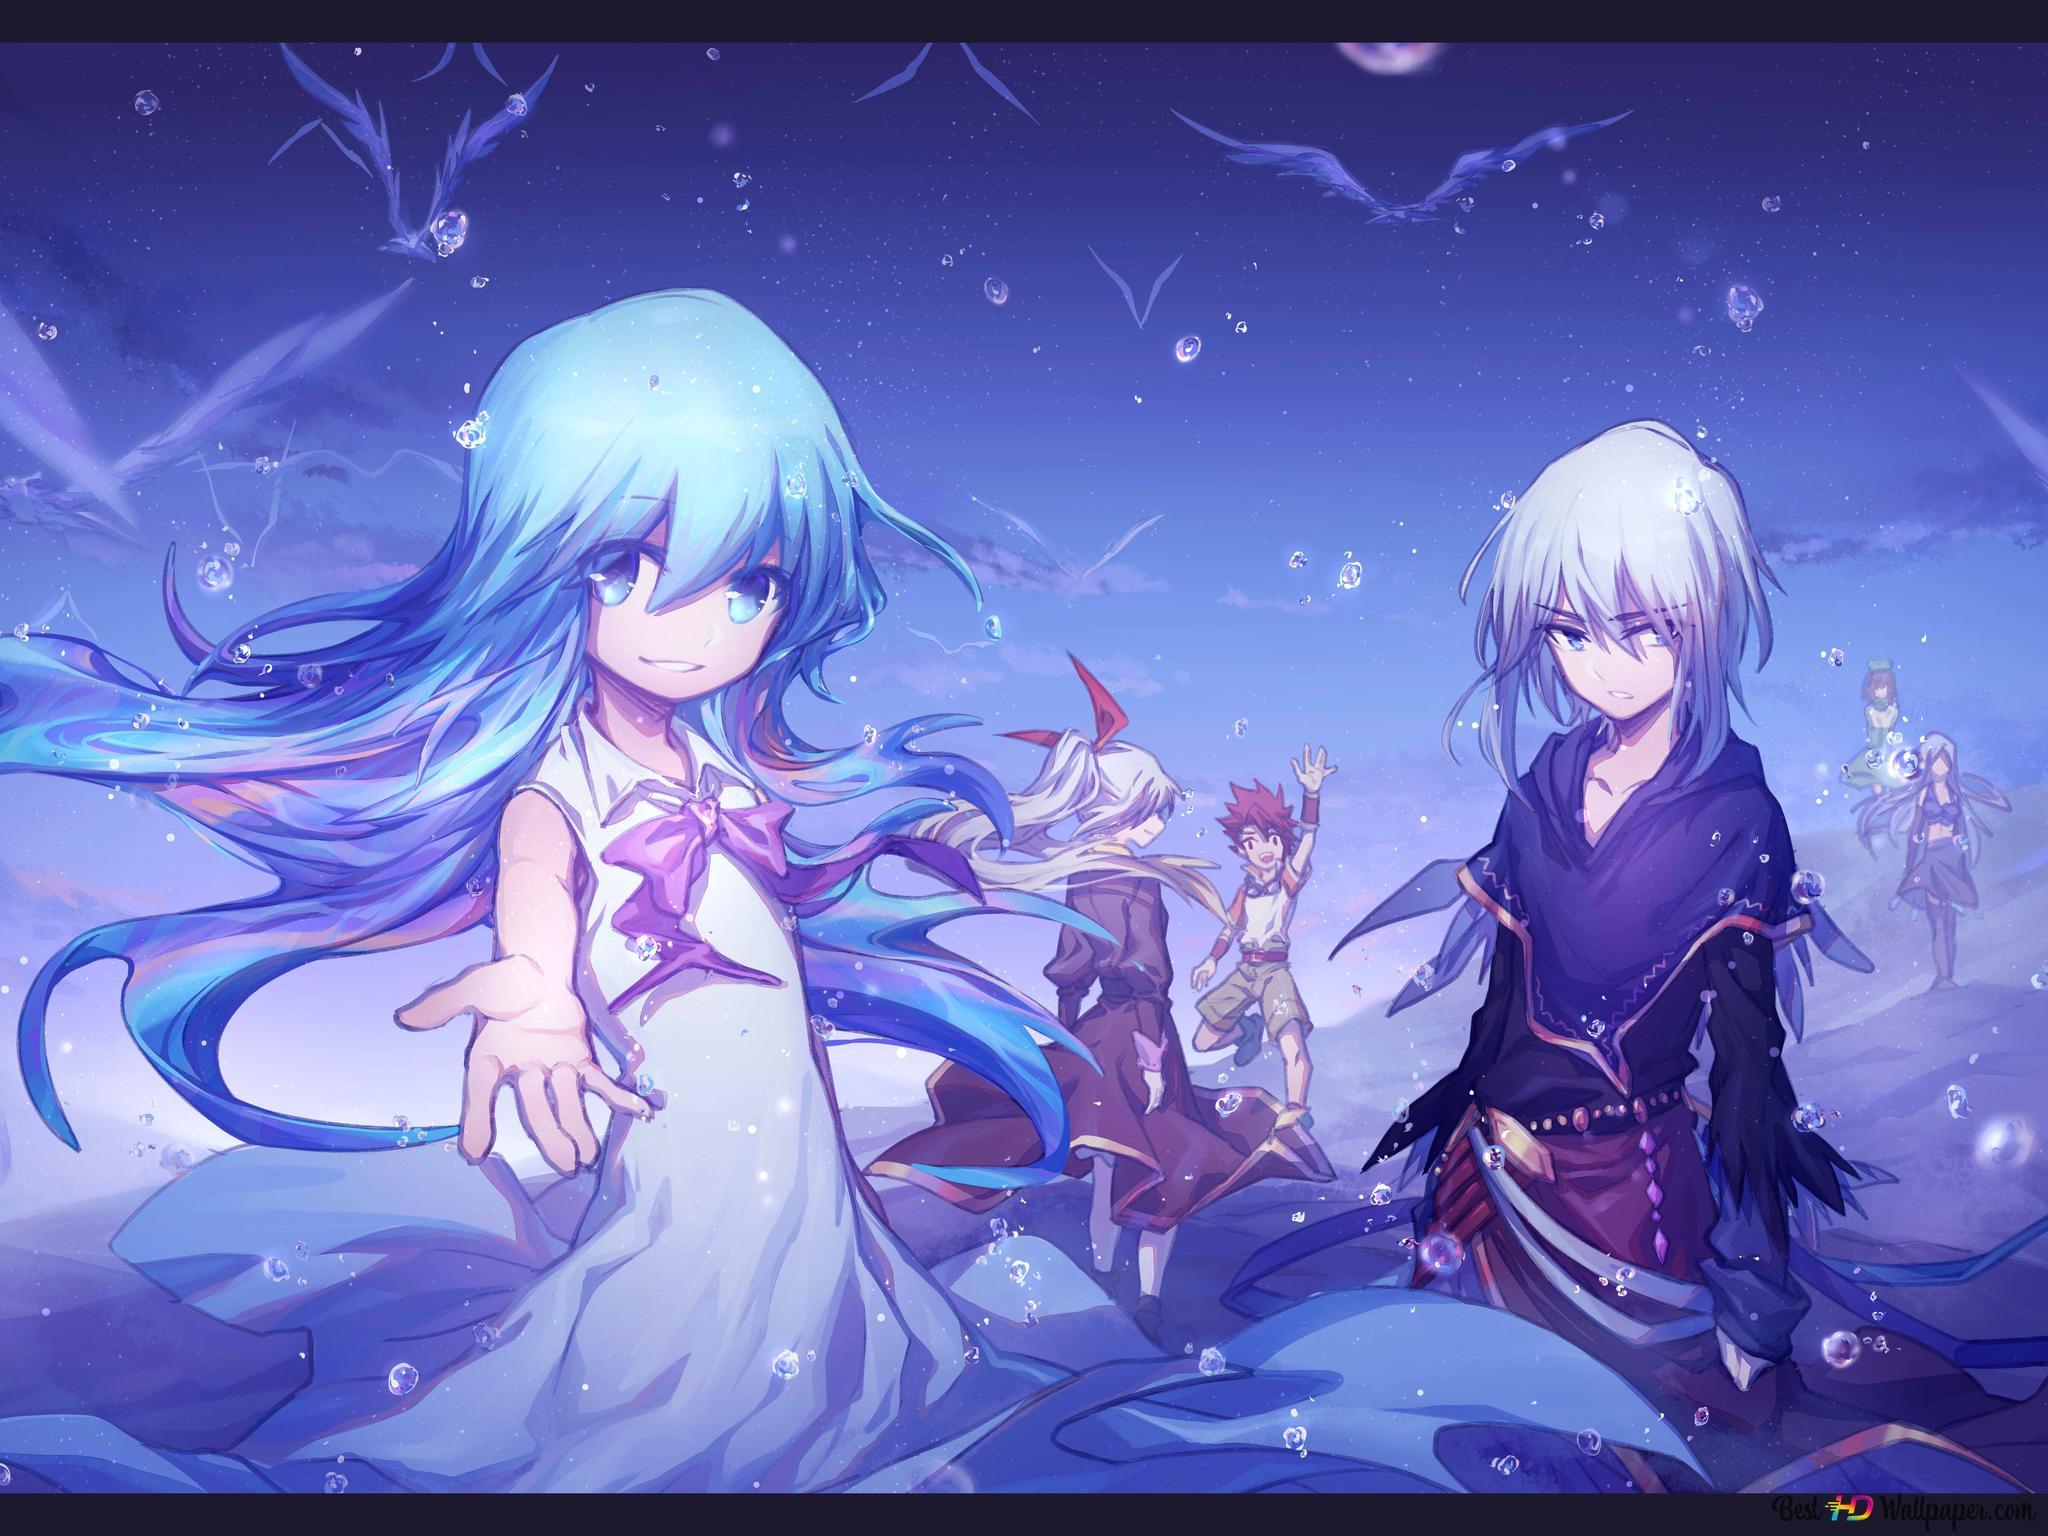 Merc Storia Anime Hd Wallpaper Download